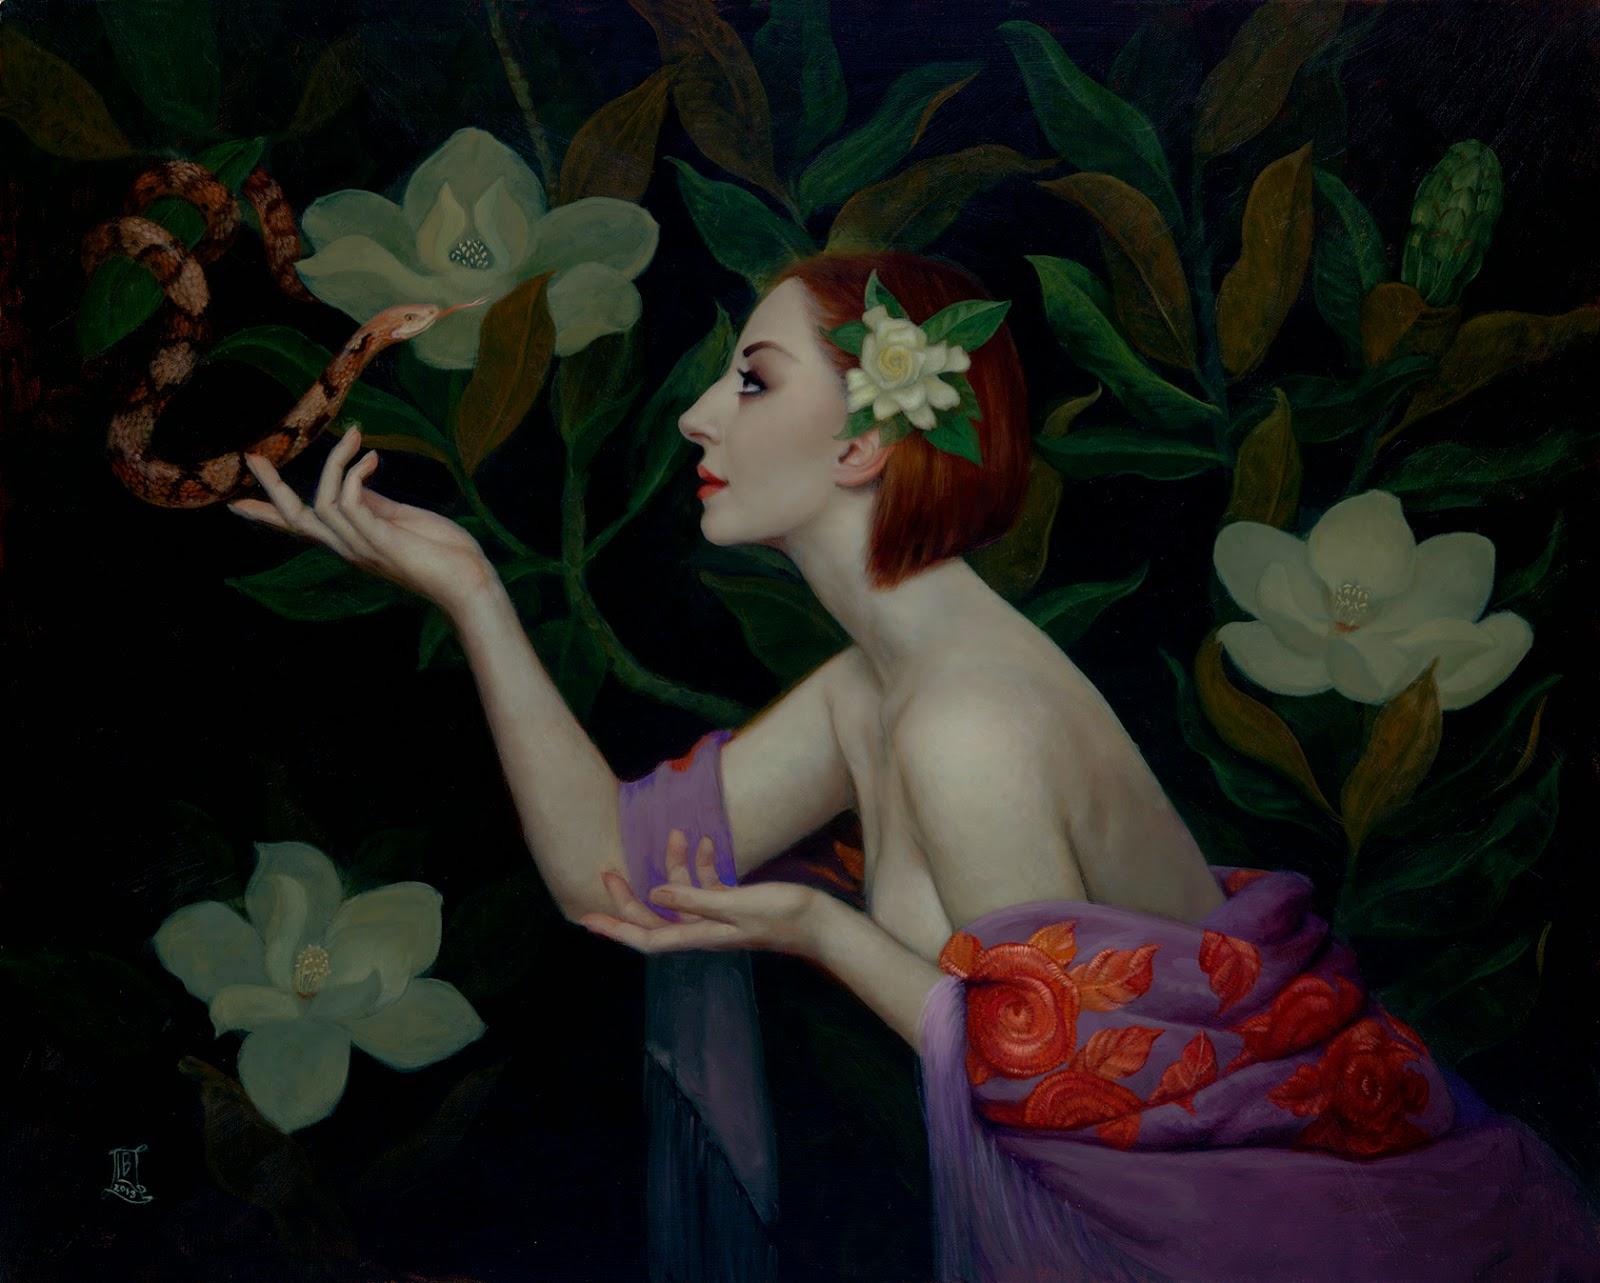 Madness, Magnolias, and Moonlight